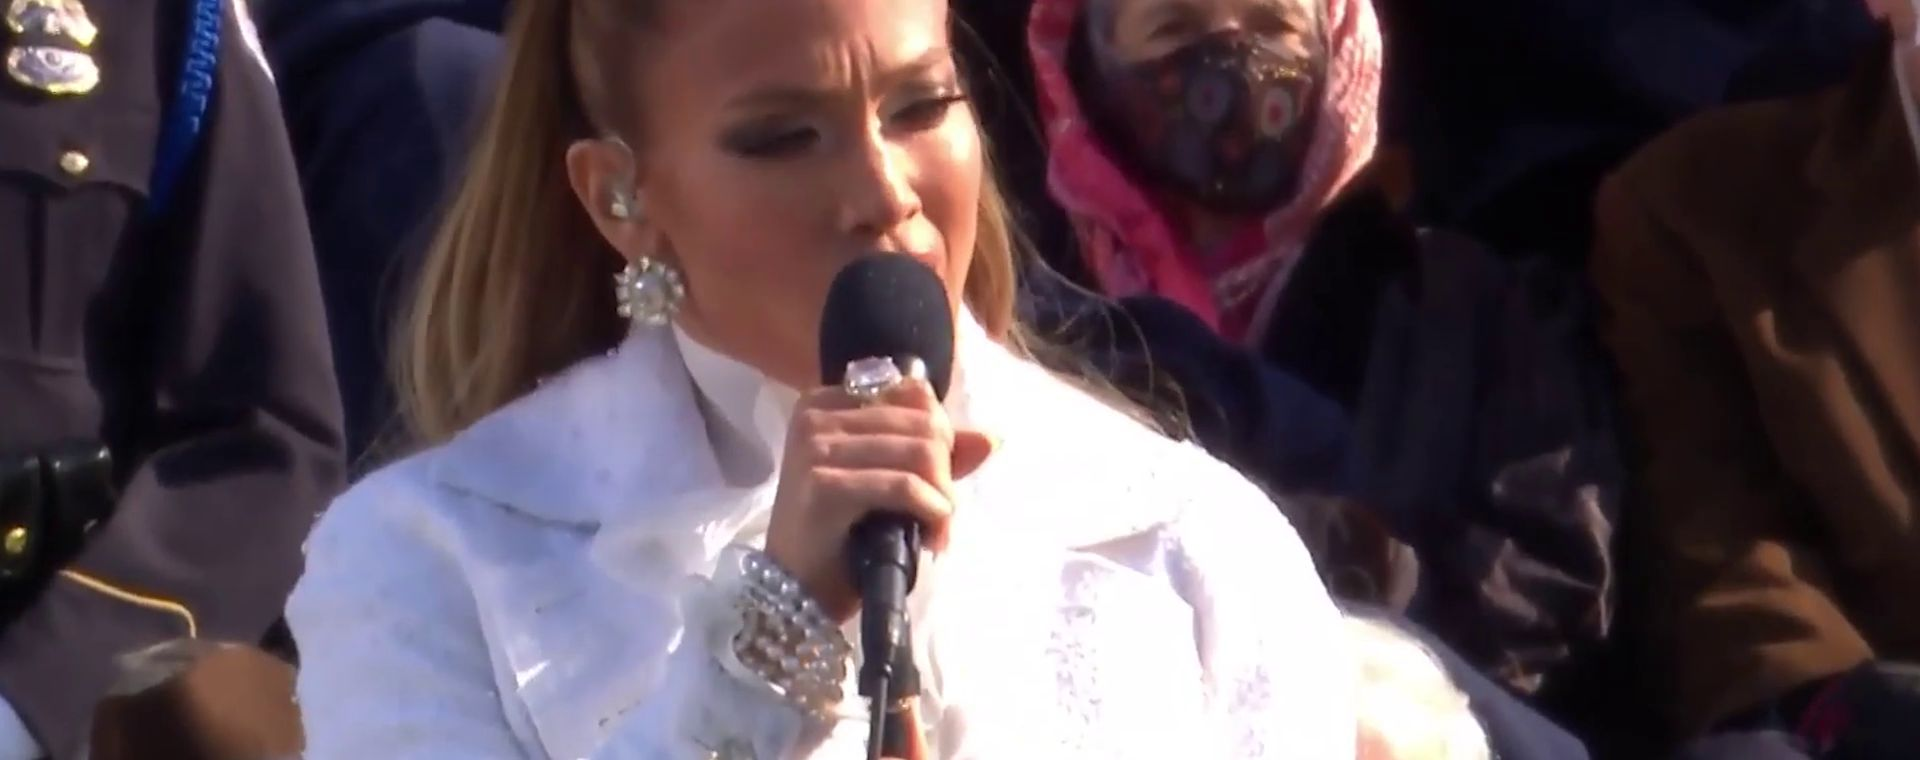 J.Lo's performance